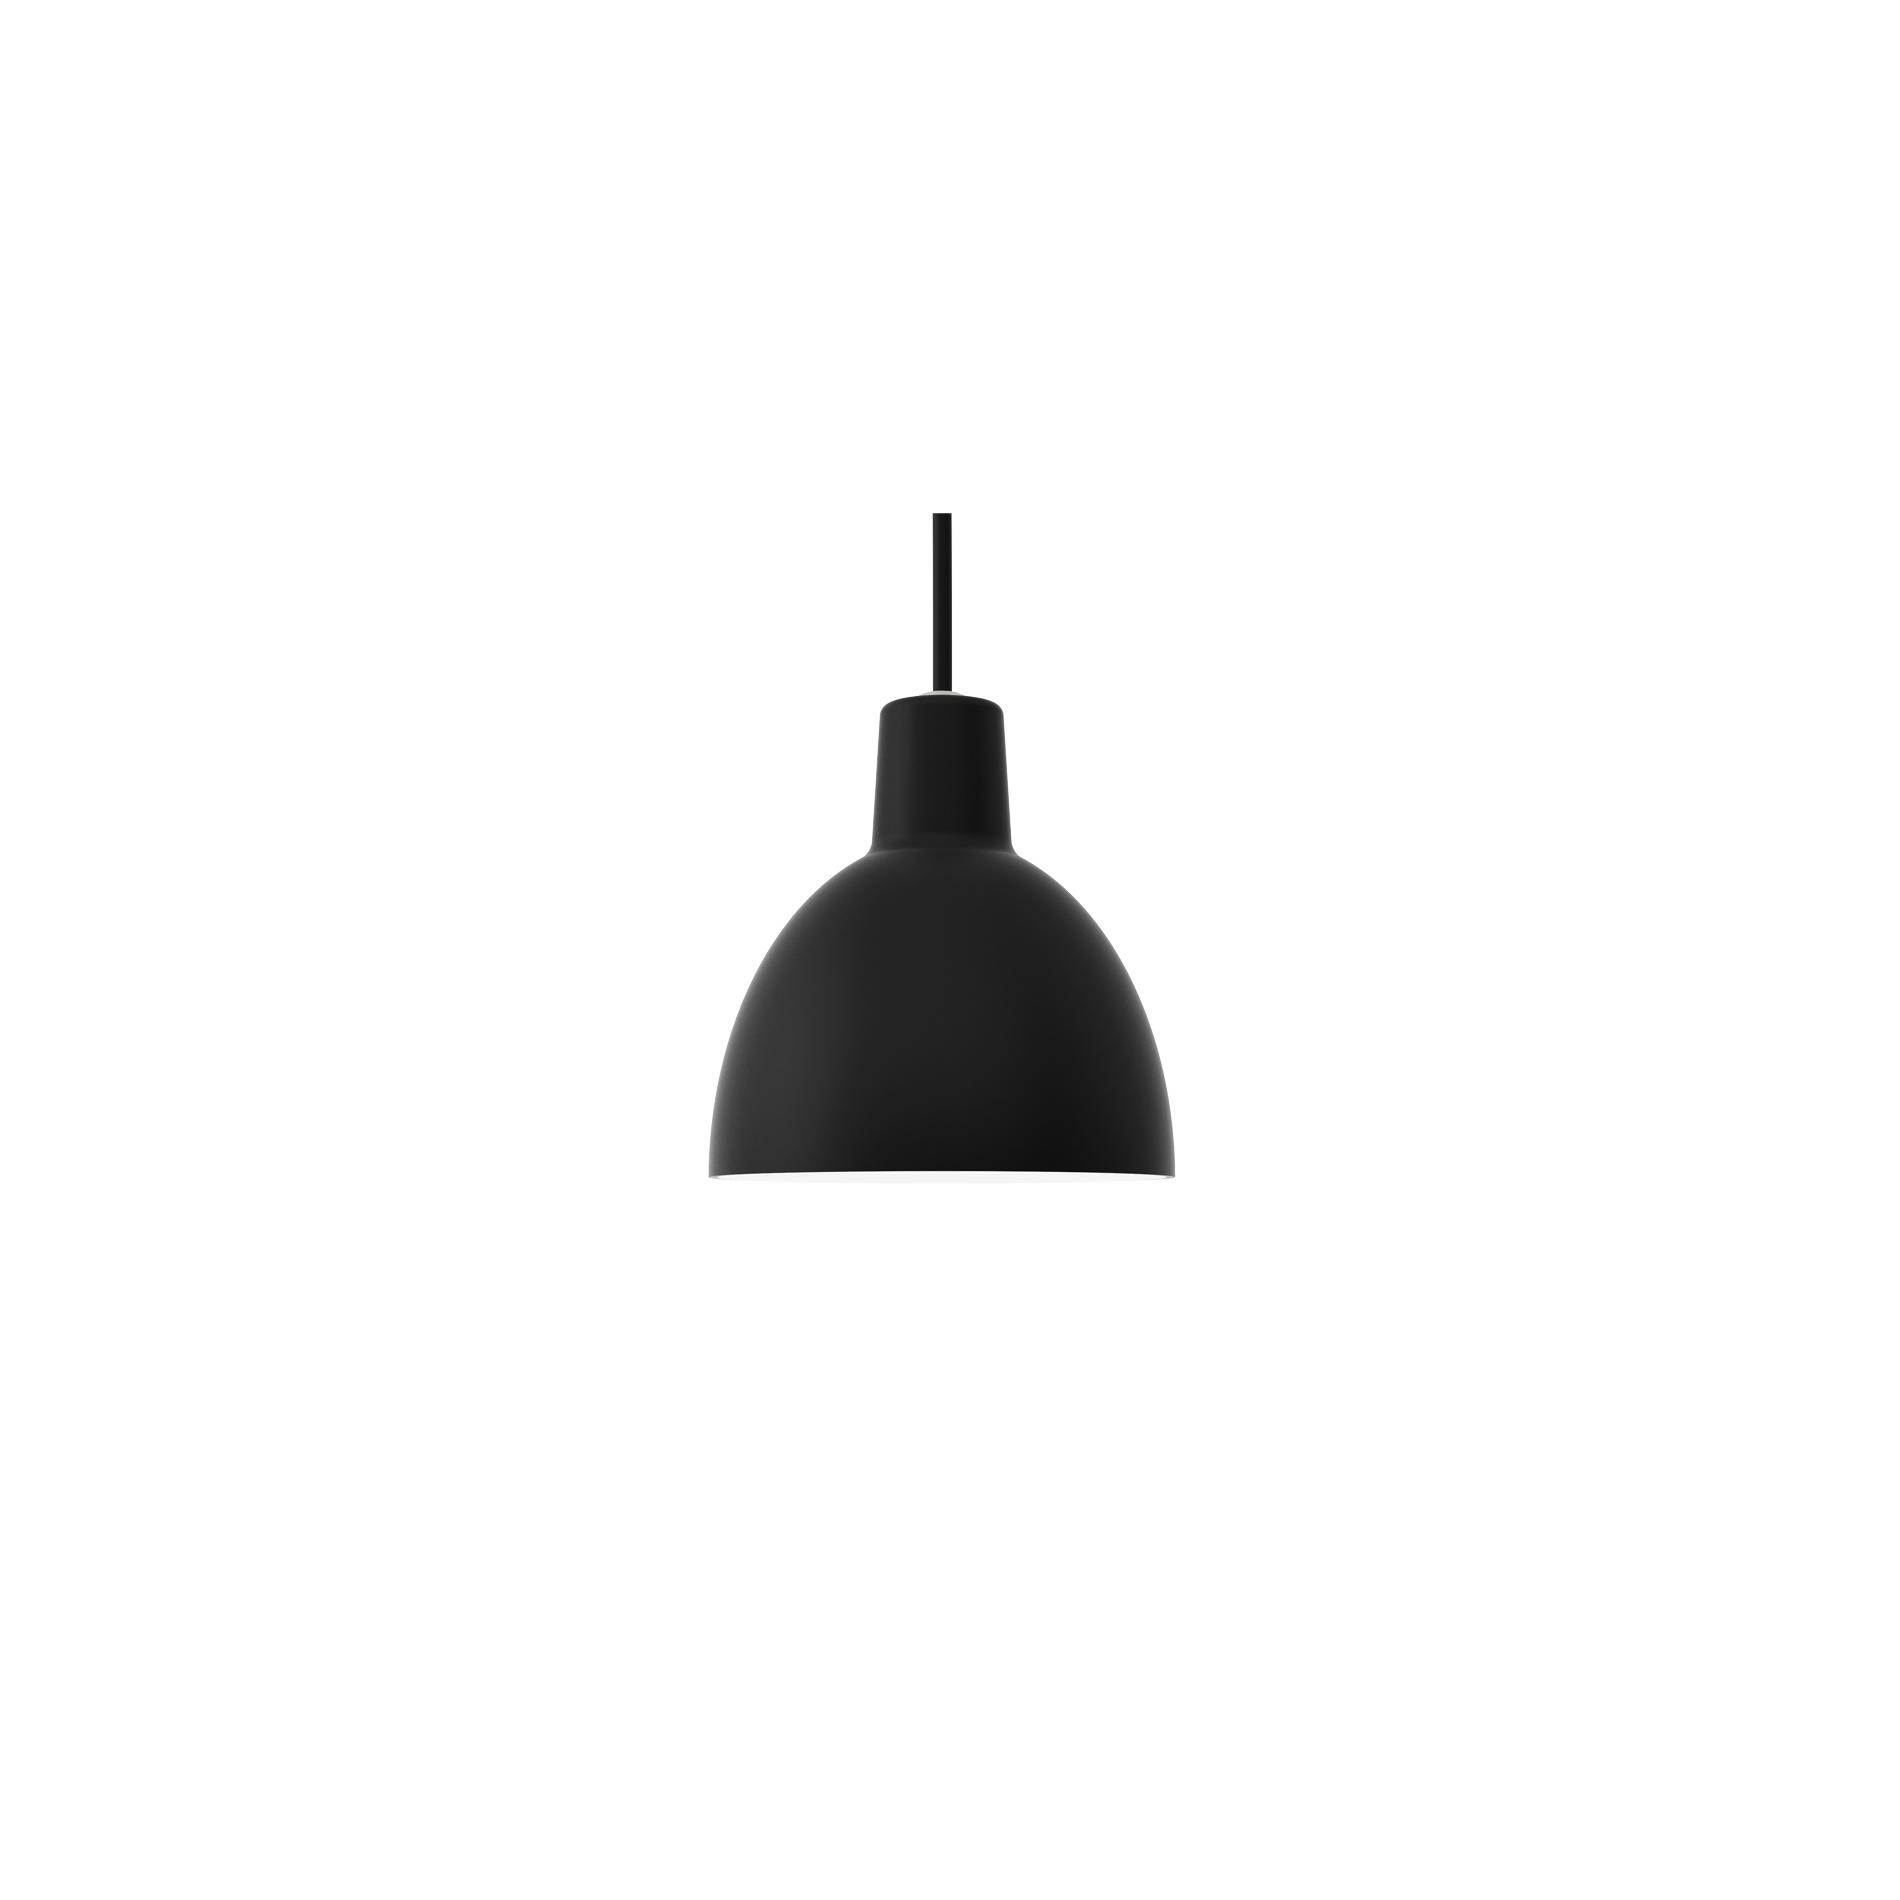 s vedalens belysning louis poulsen toldbod 120 svart s vedalens belysning. Black Bedroom Furniture Sets. Home Design Ideas